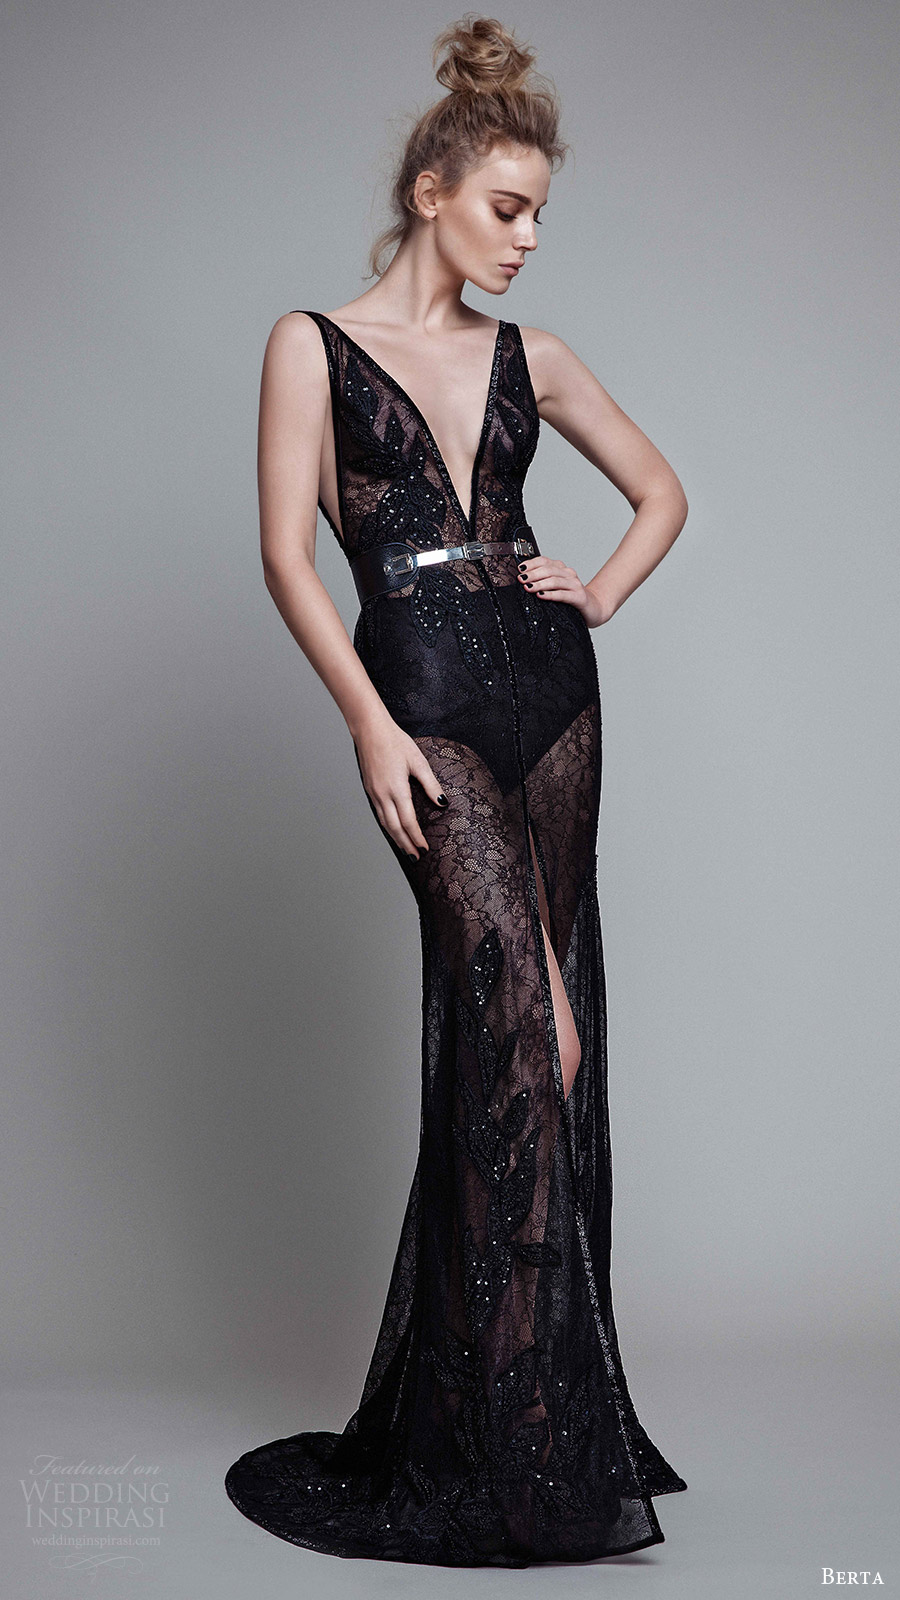 berta rtw fall 2017 (17 21) sleeveless deep v neck sheath embellished black evening dress slit skirt mv